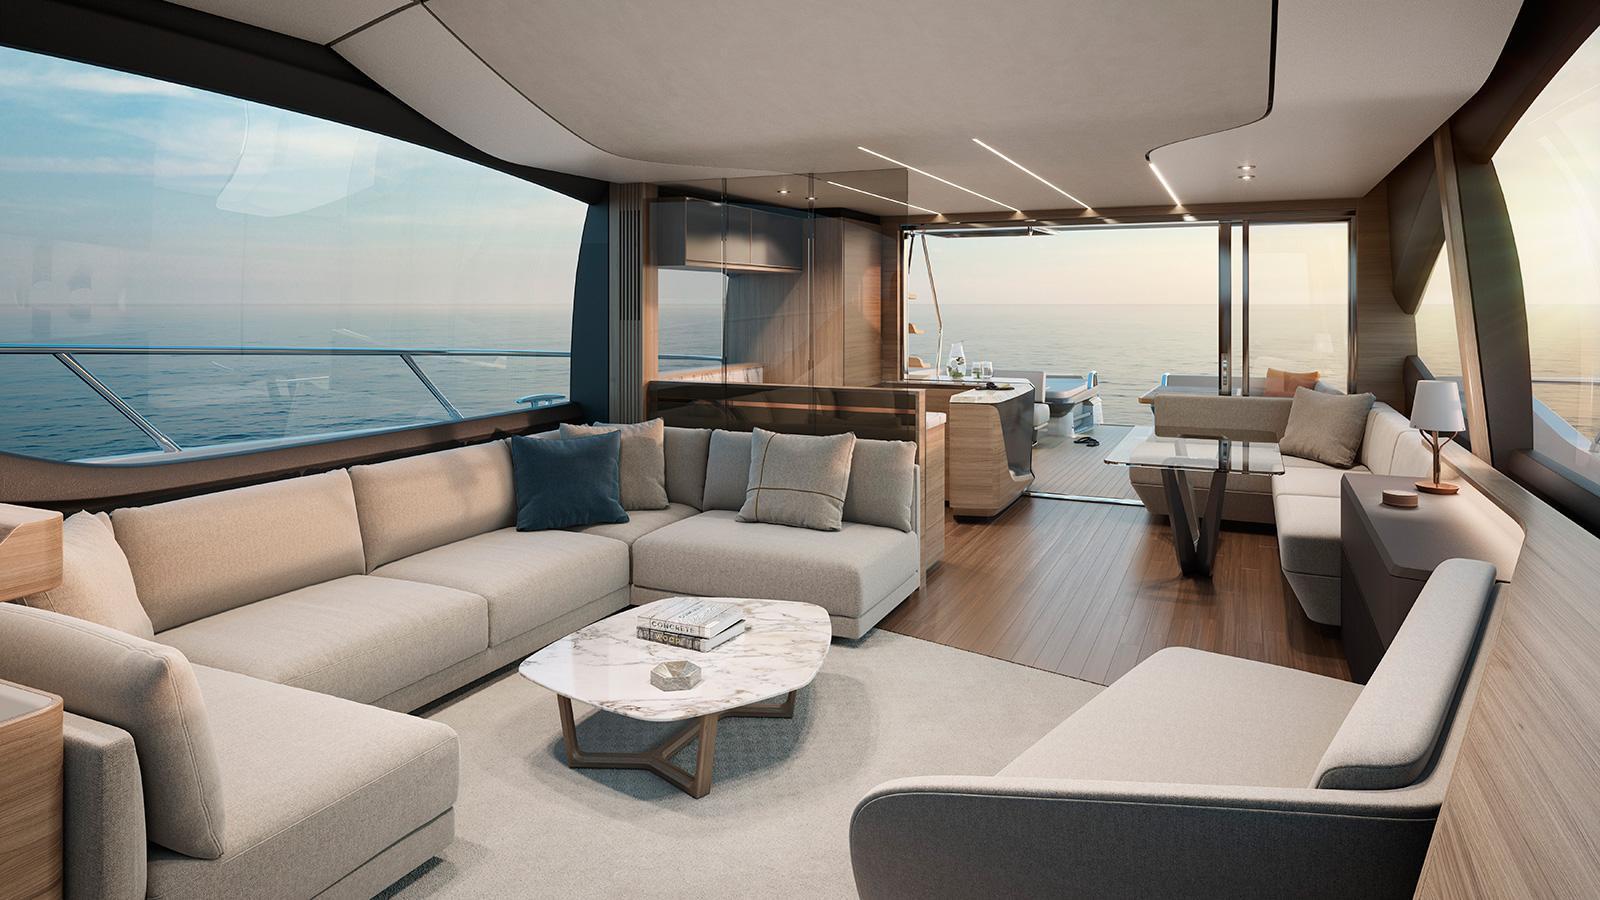 Princess S78 motoryacht Princess 24m 2019 saloon sistership